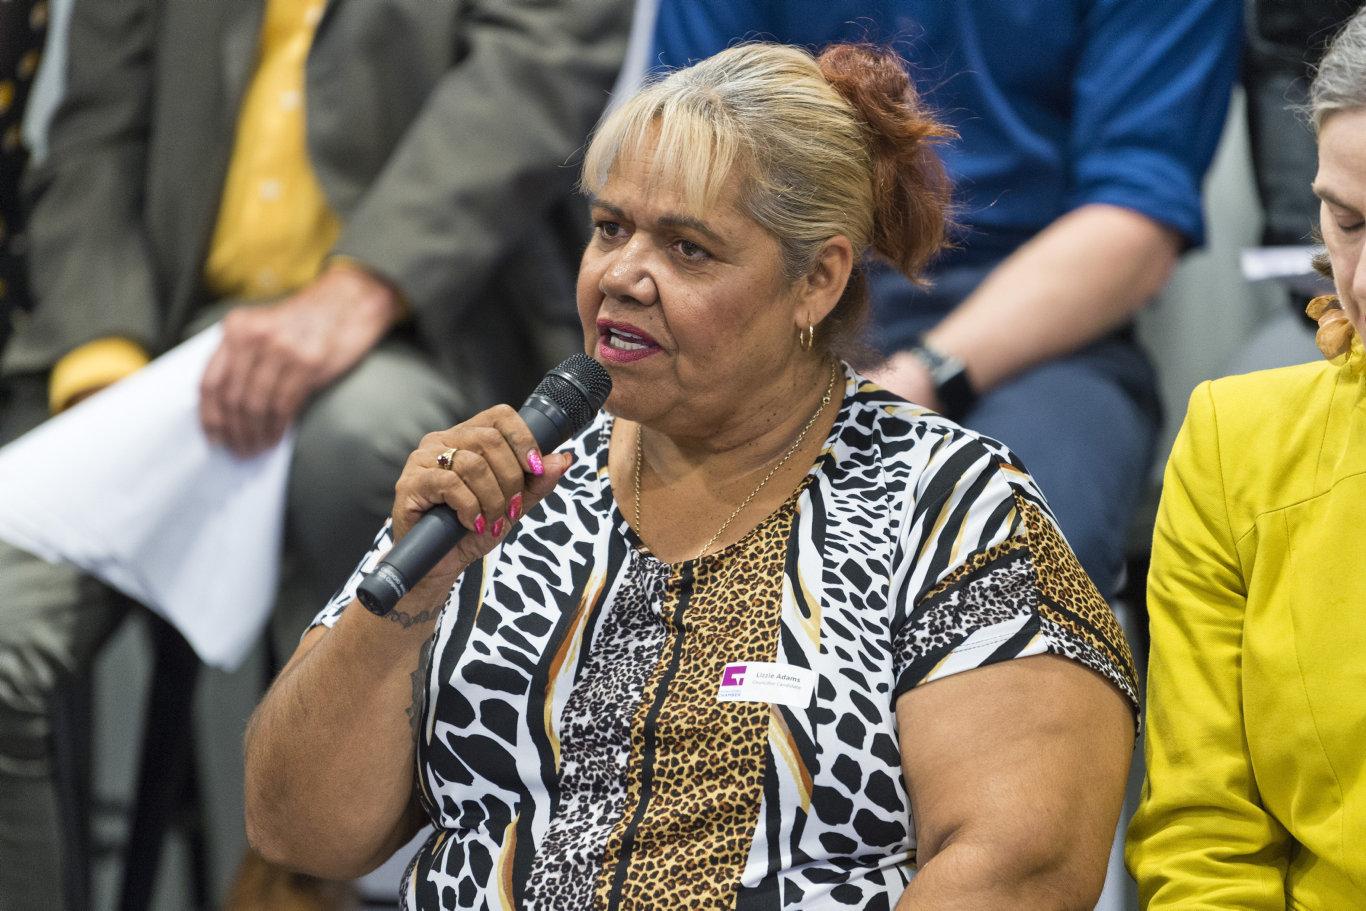 Lizzie Adams at a council forum.